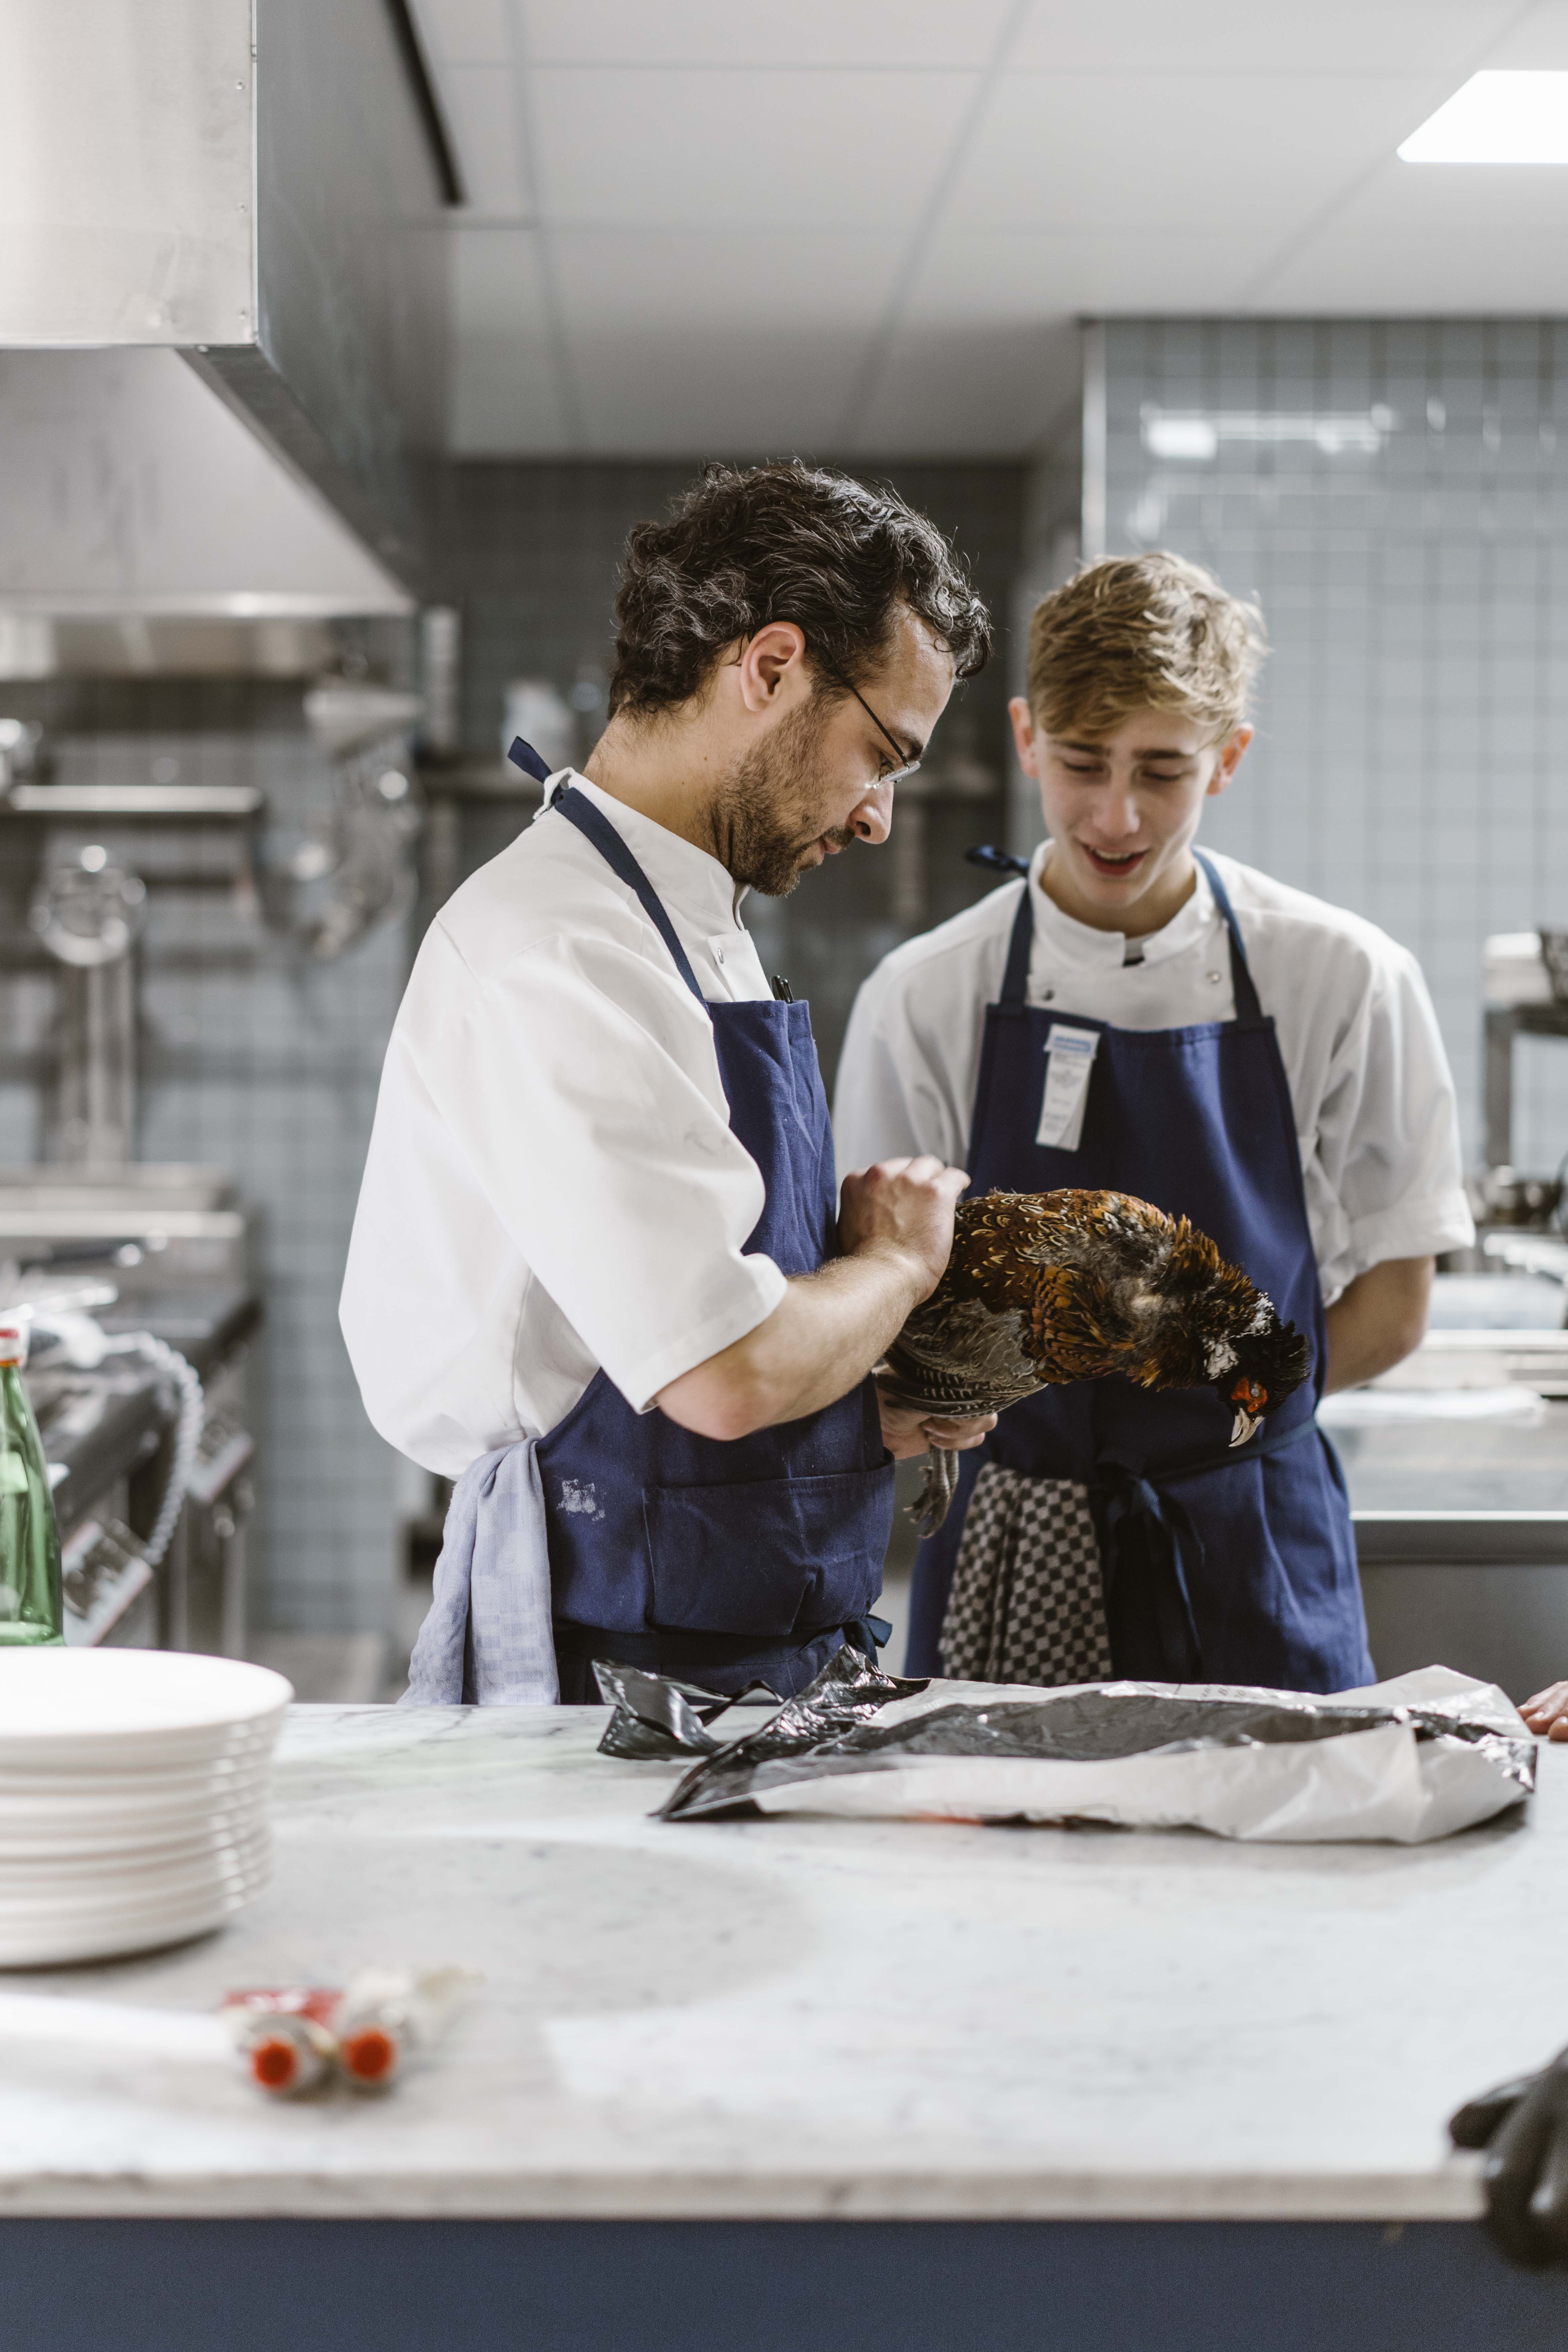 Restaurant_Entrepot_20_-_©_Chantal_Arnts_fotografie_&_video